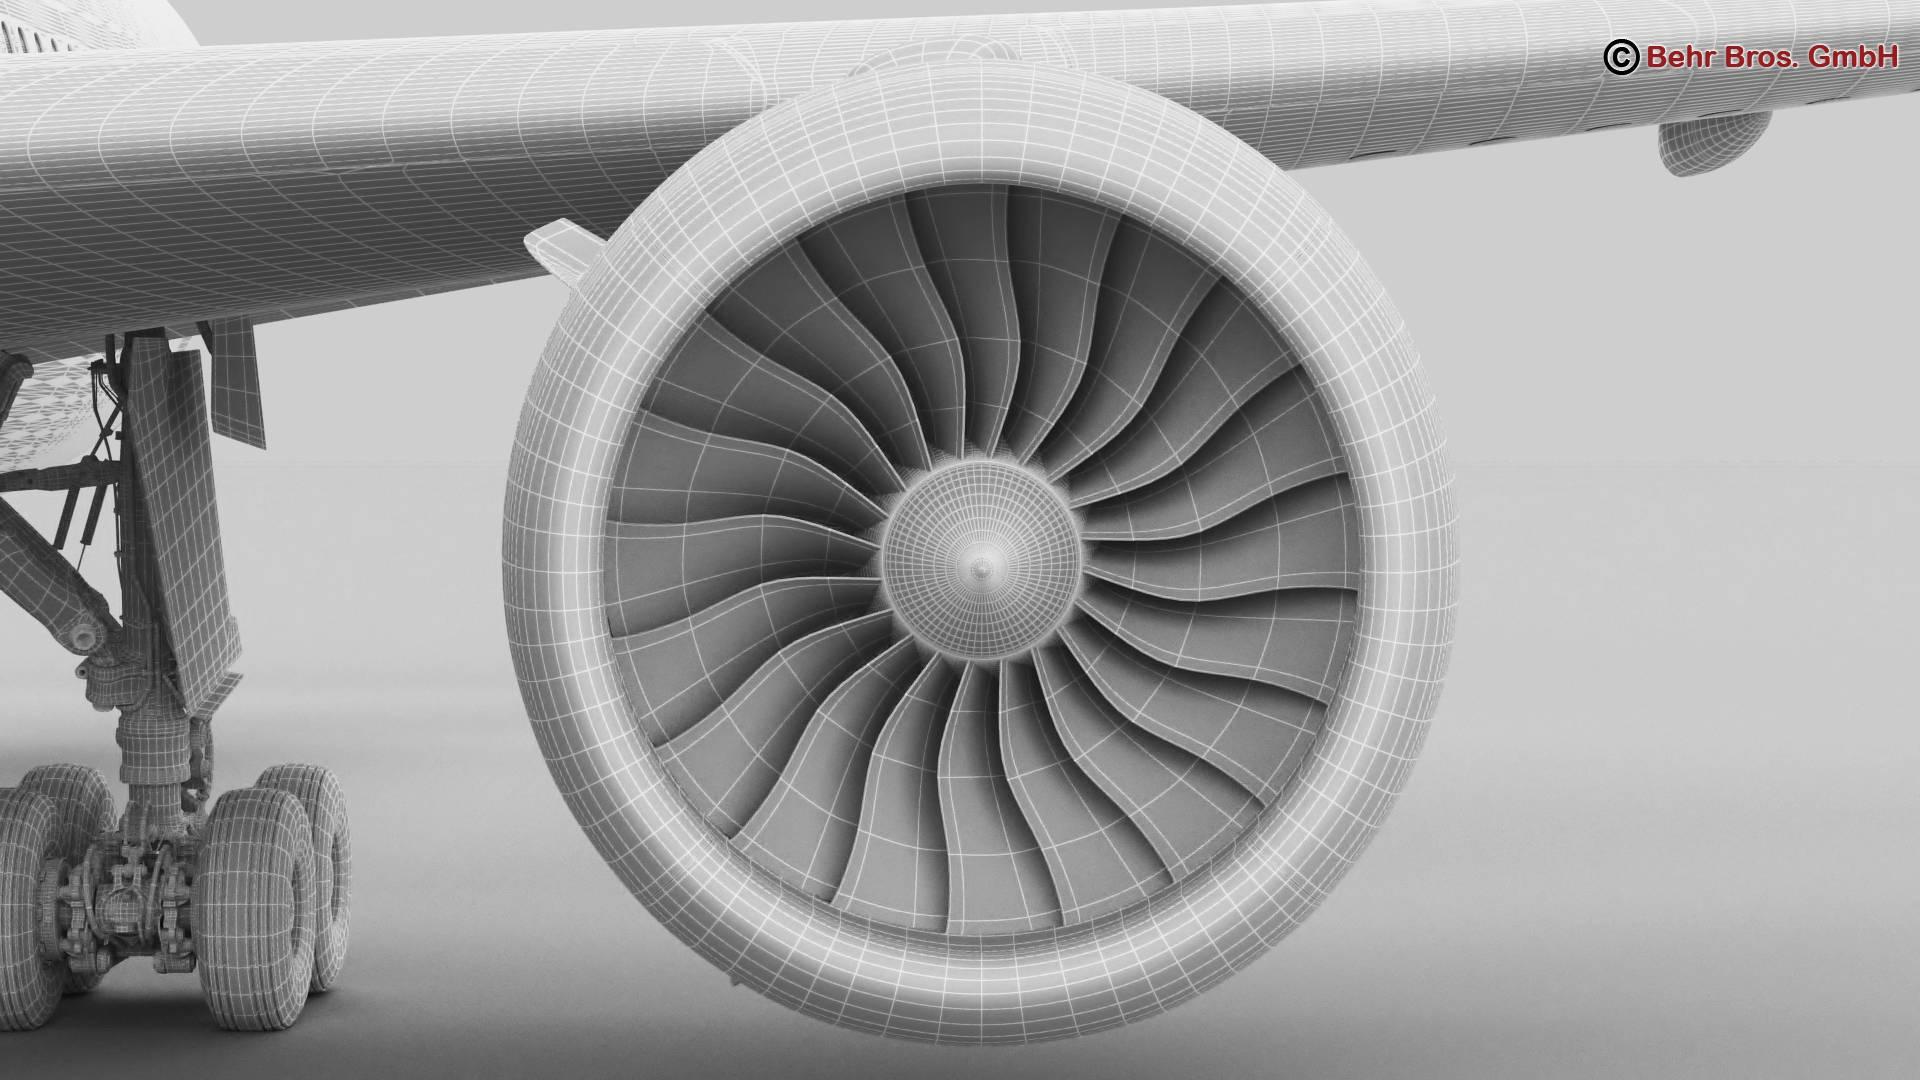 boeing 787-8 3d model 3ds max fbx c4d lwo ma mb obj 251370